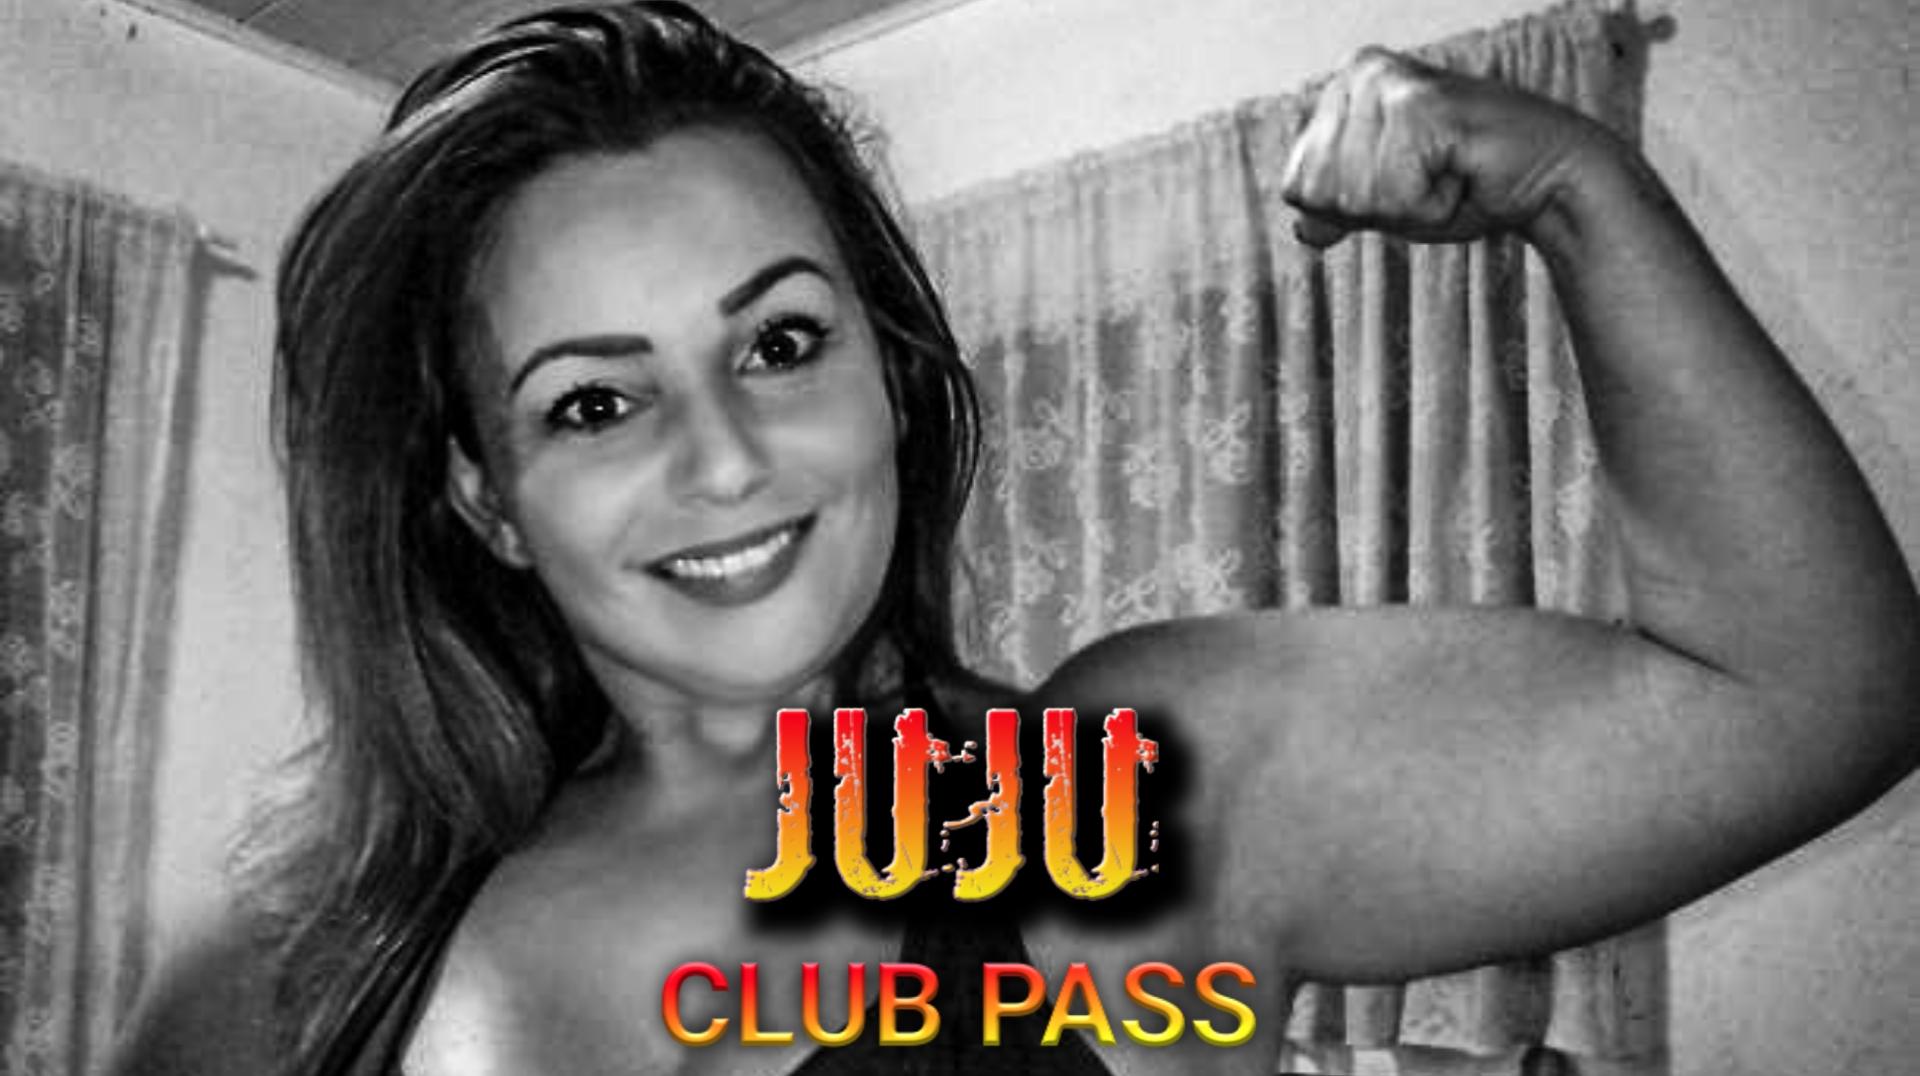 Juju Club Pass